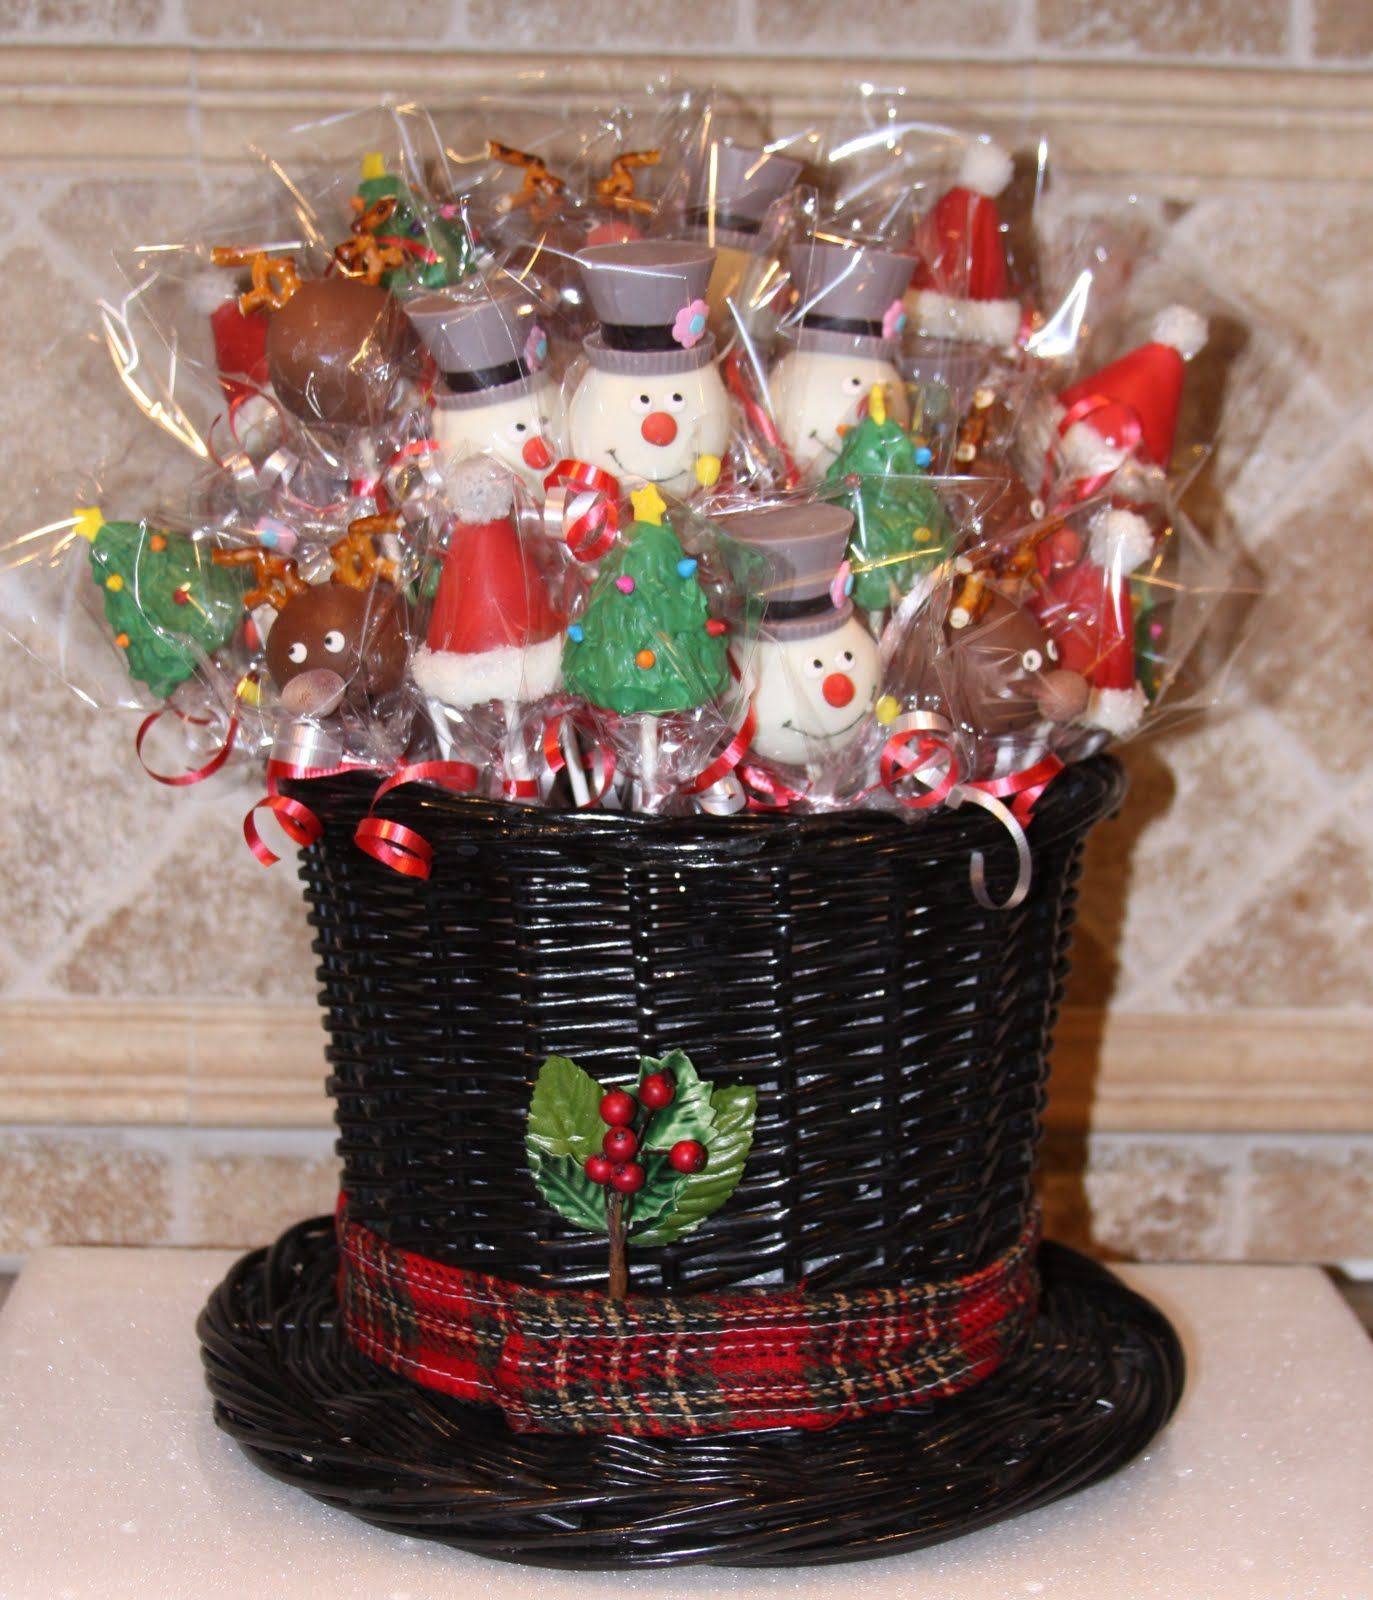 Christmas Cake Pop Arrangements